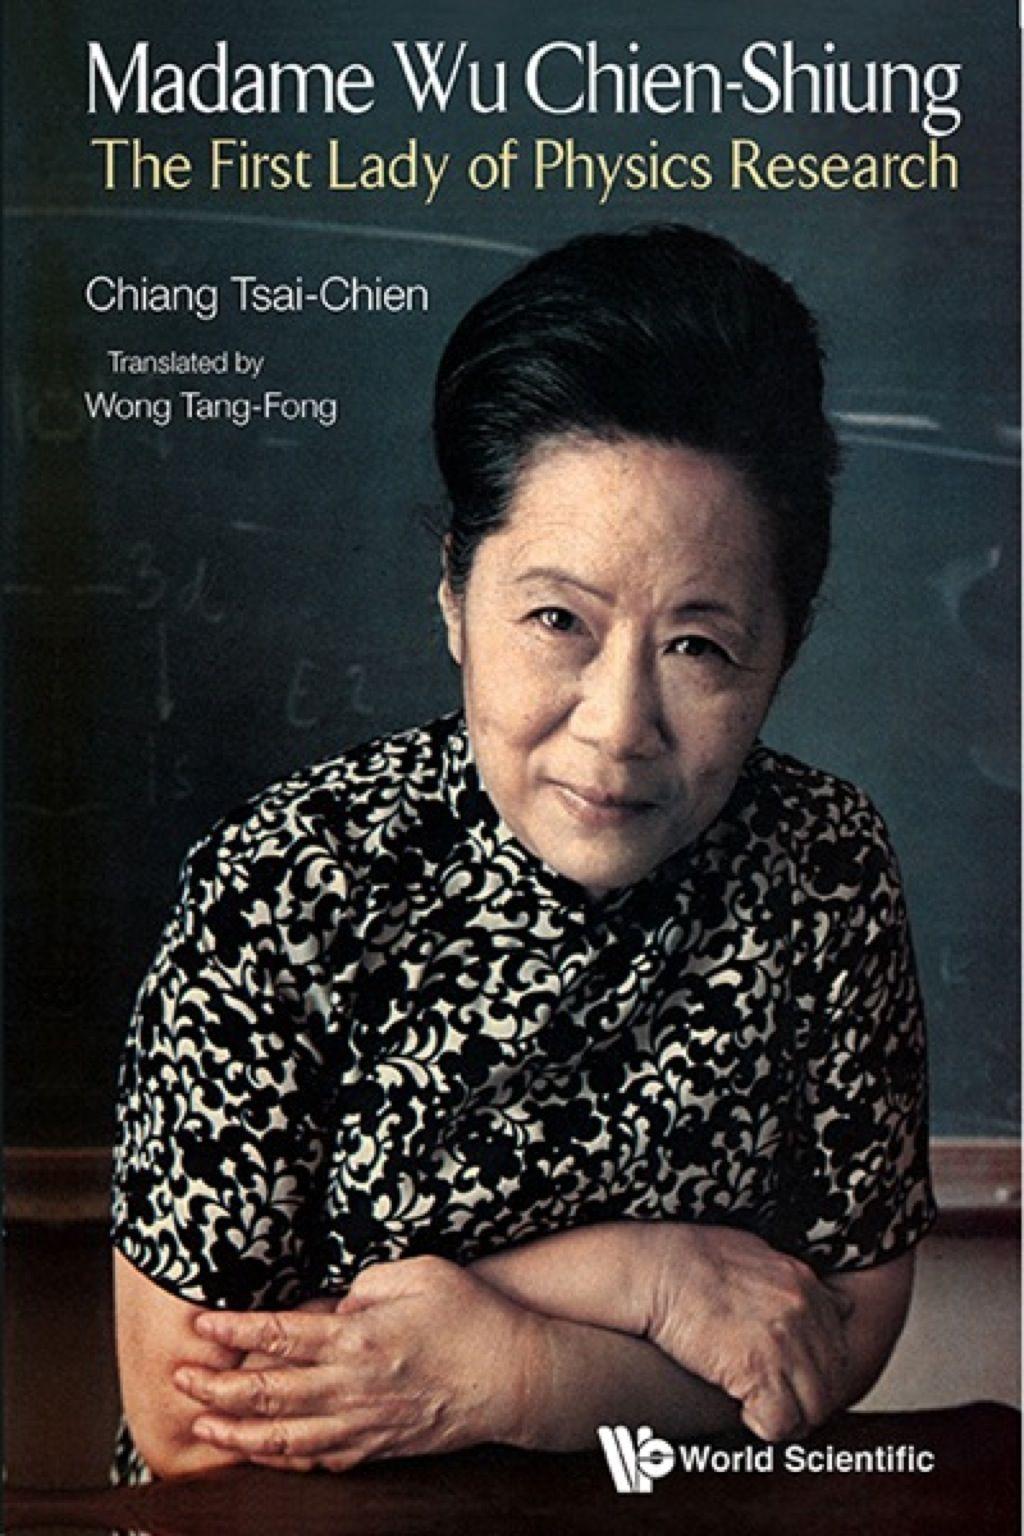 Madame Wu Chien Shiung Ebook In